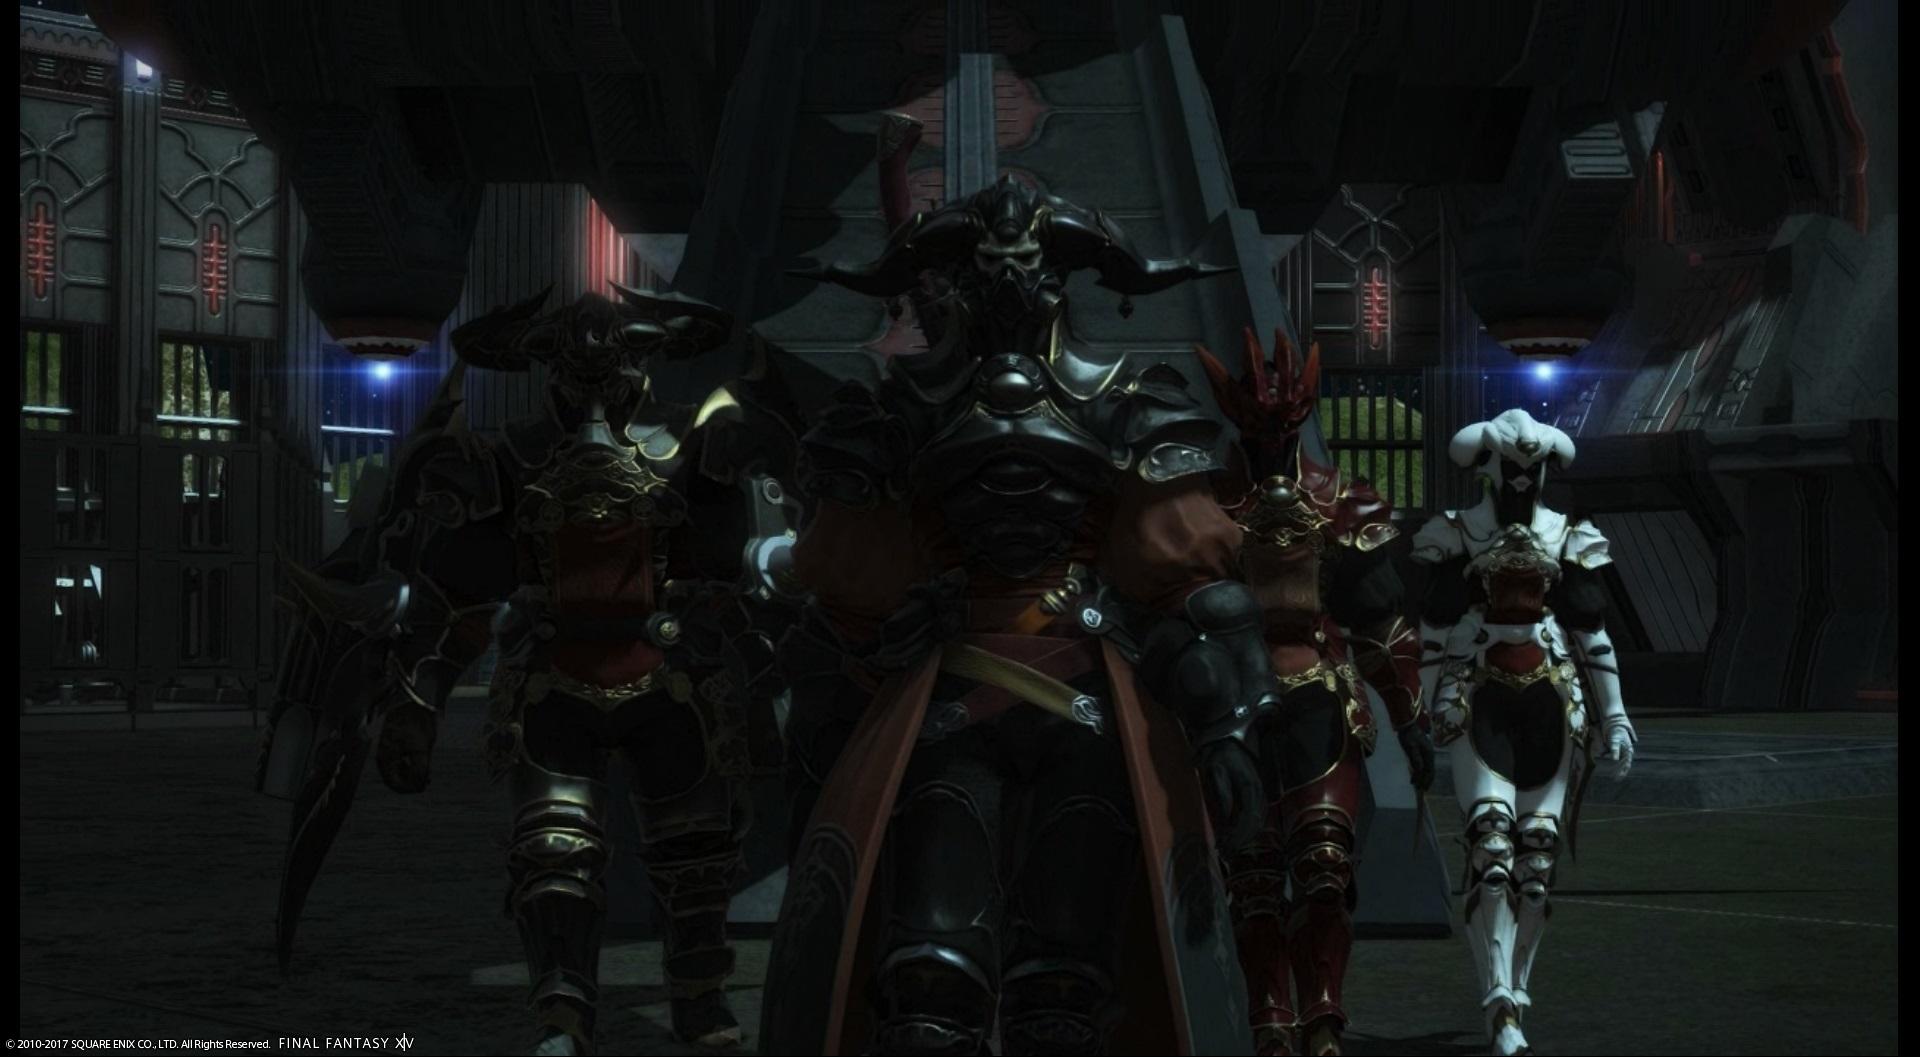 [PCゲーム]FINAL FANTASY XIVの世界へ5